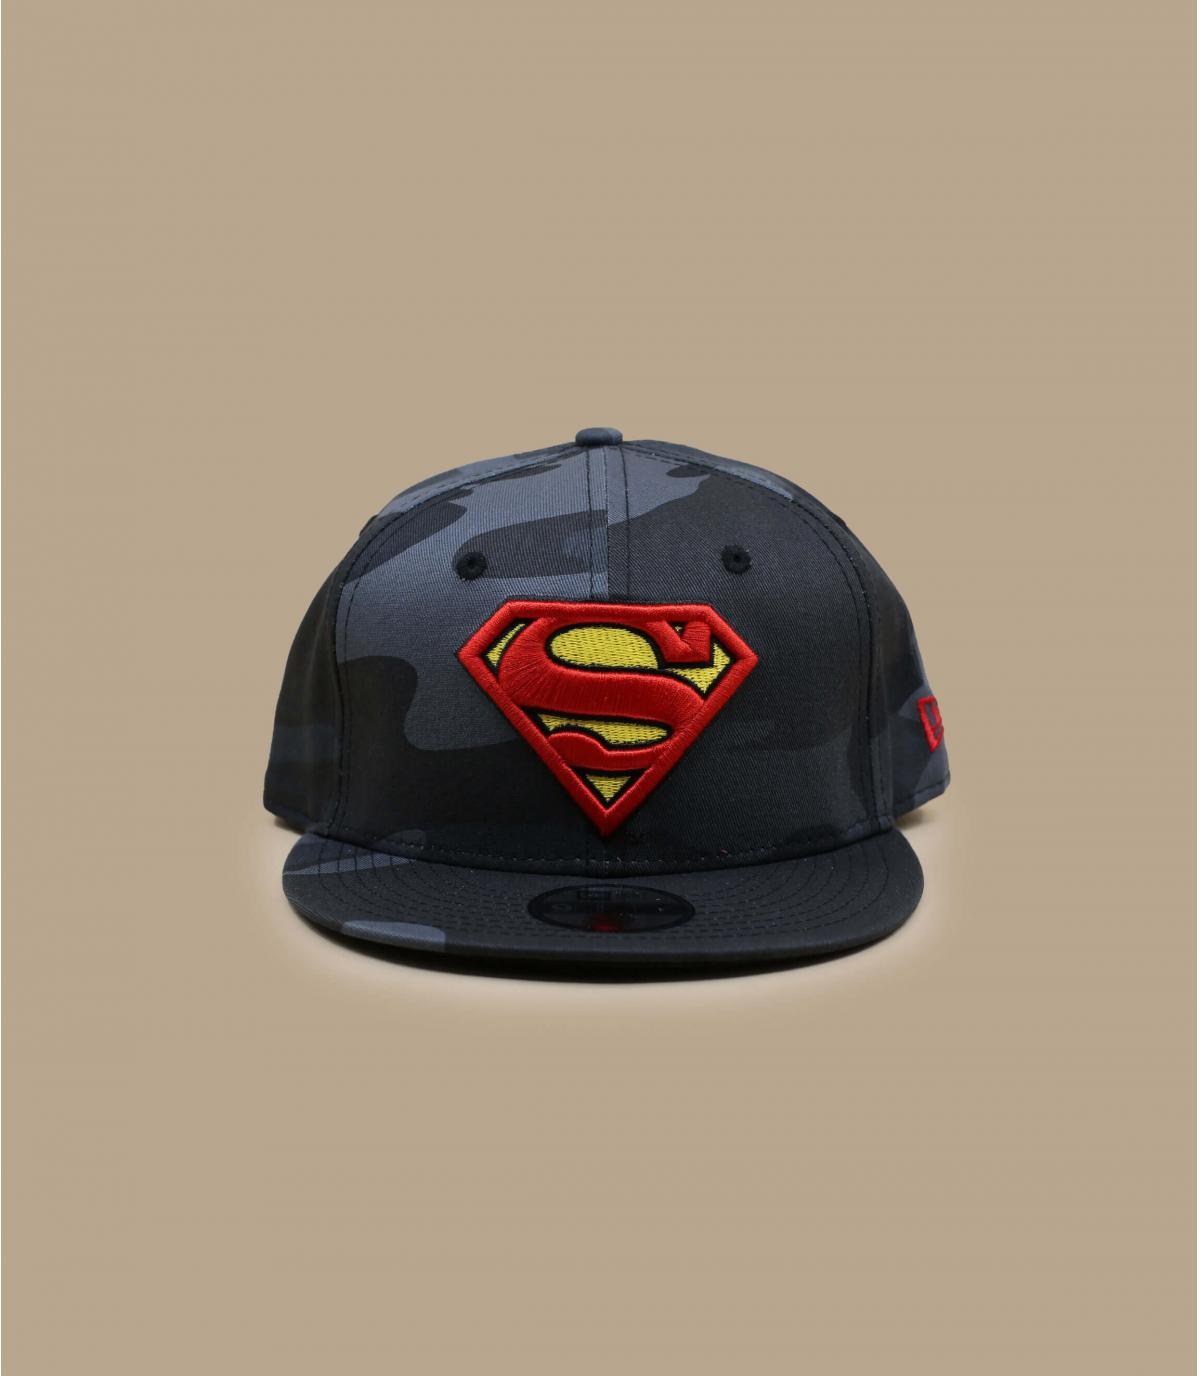 Details Snapback Kids Superman Camo 950 midnight - Abbildung 2